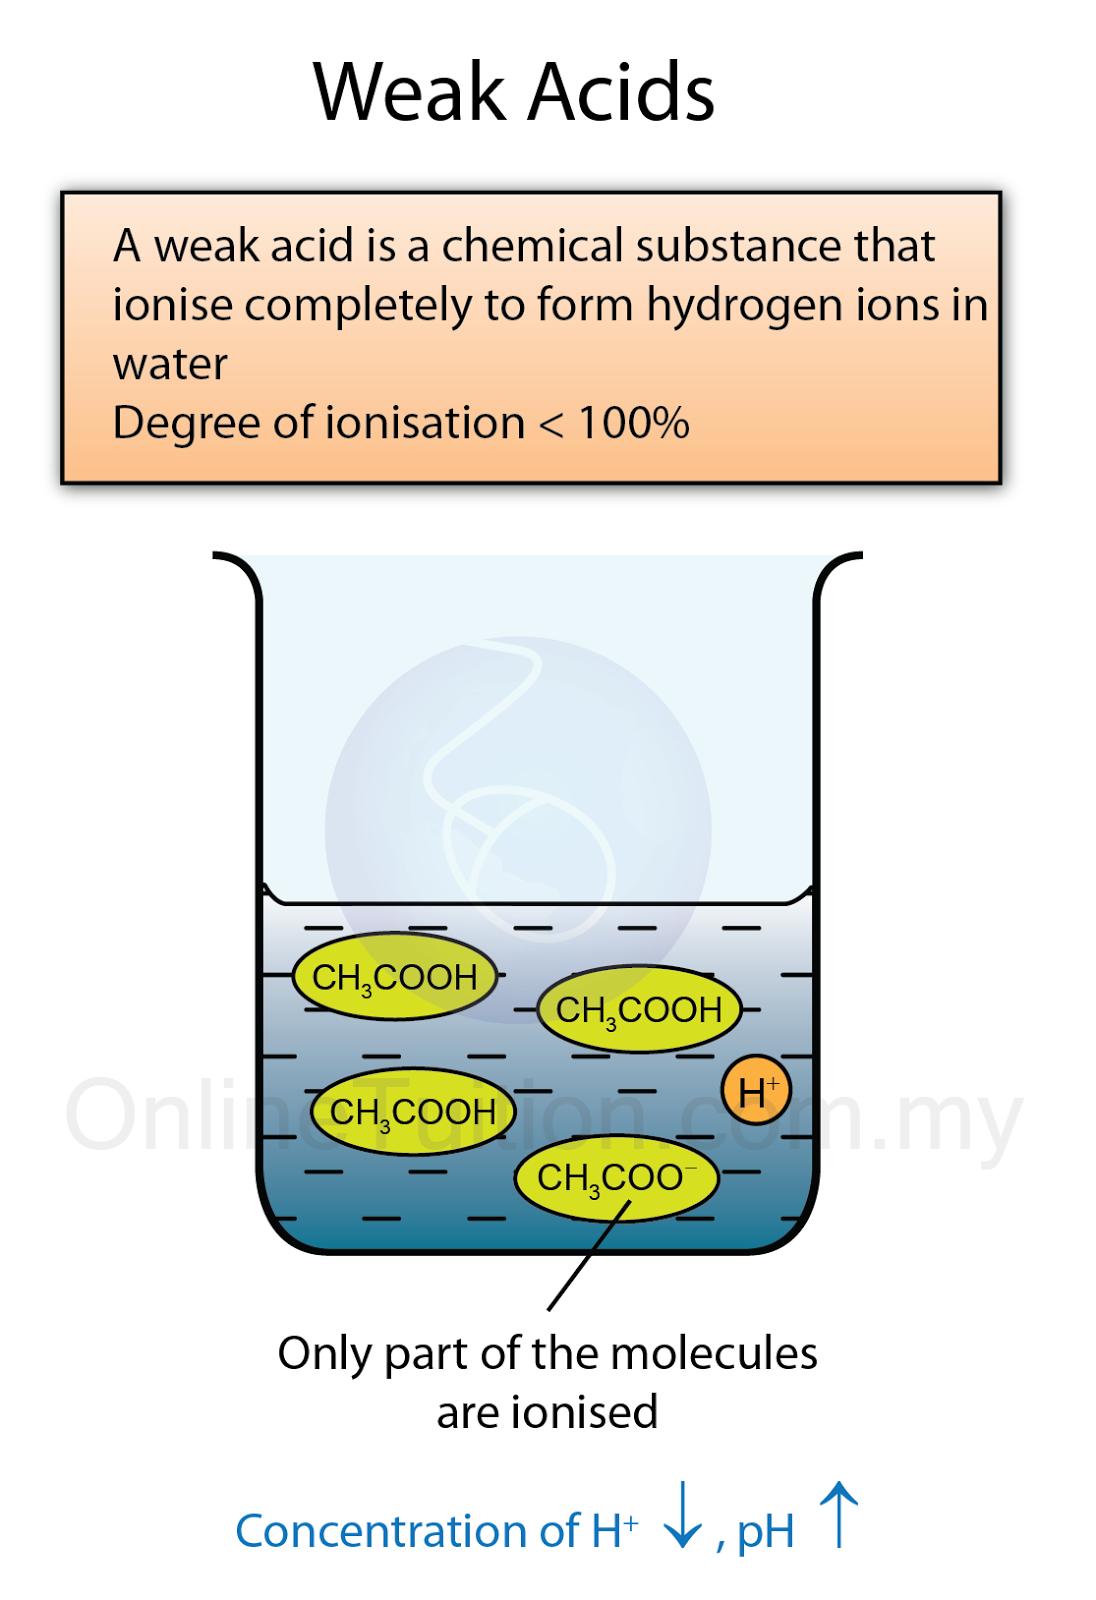 Strong Acids and Weak Acids | SPM Chemistry Form 4/Form 5 Revision ...